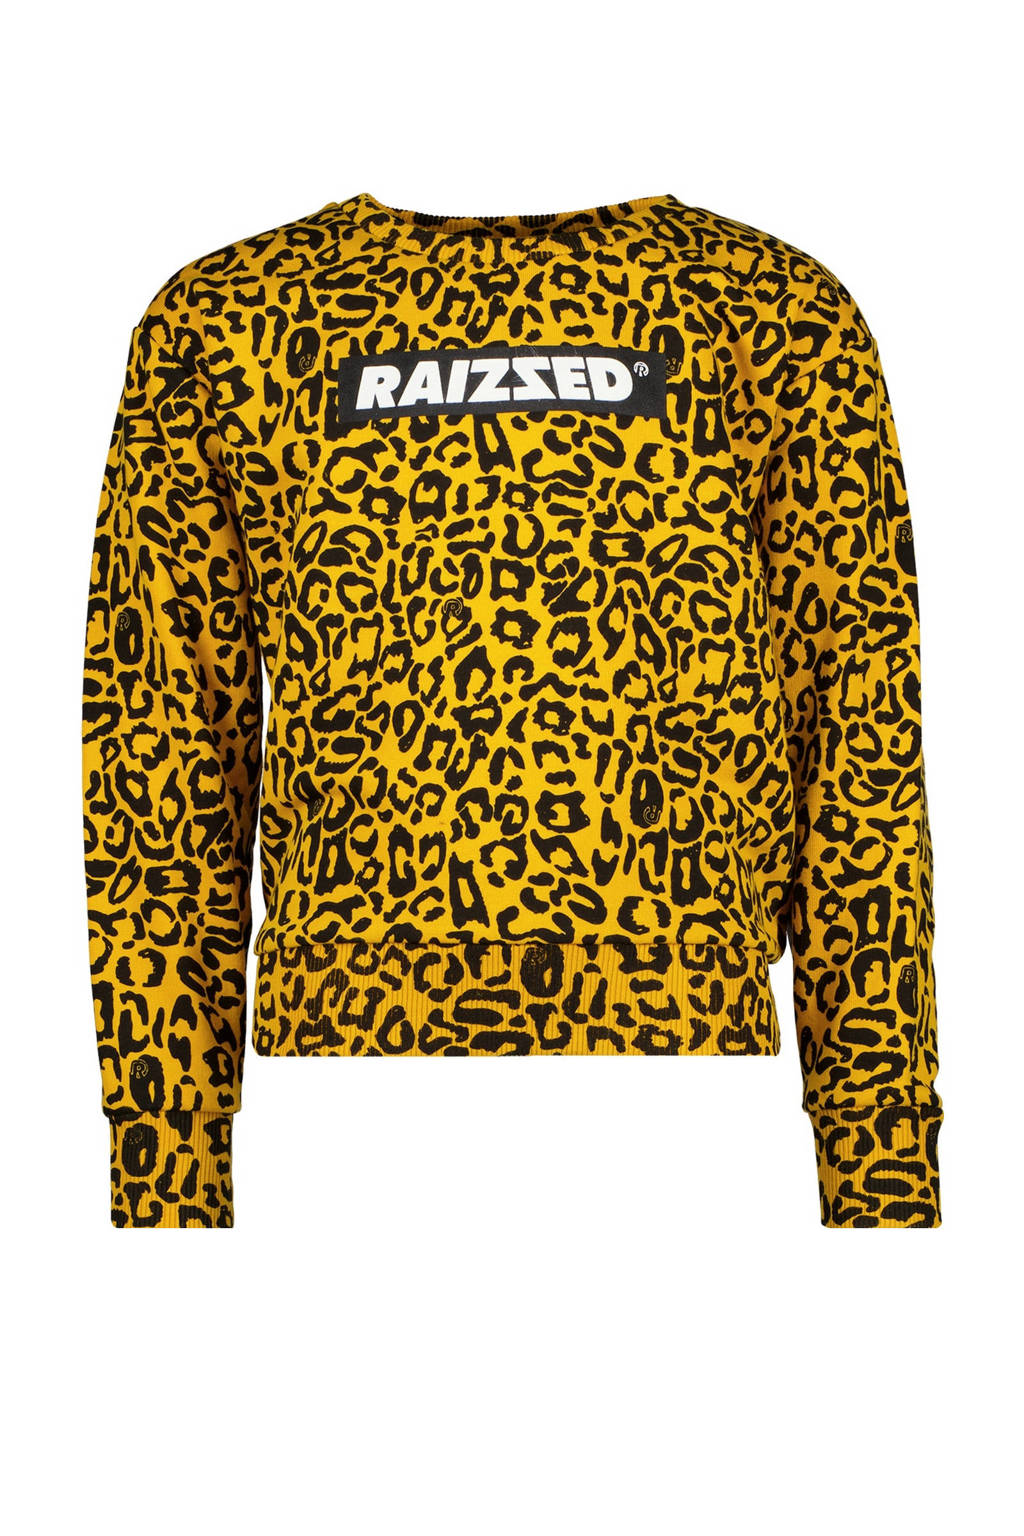 Raizzed sweater Madison met panterprint okergeel/zwart